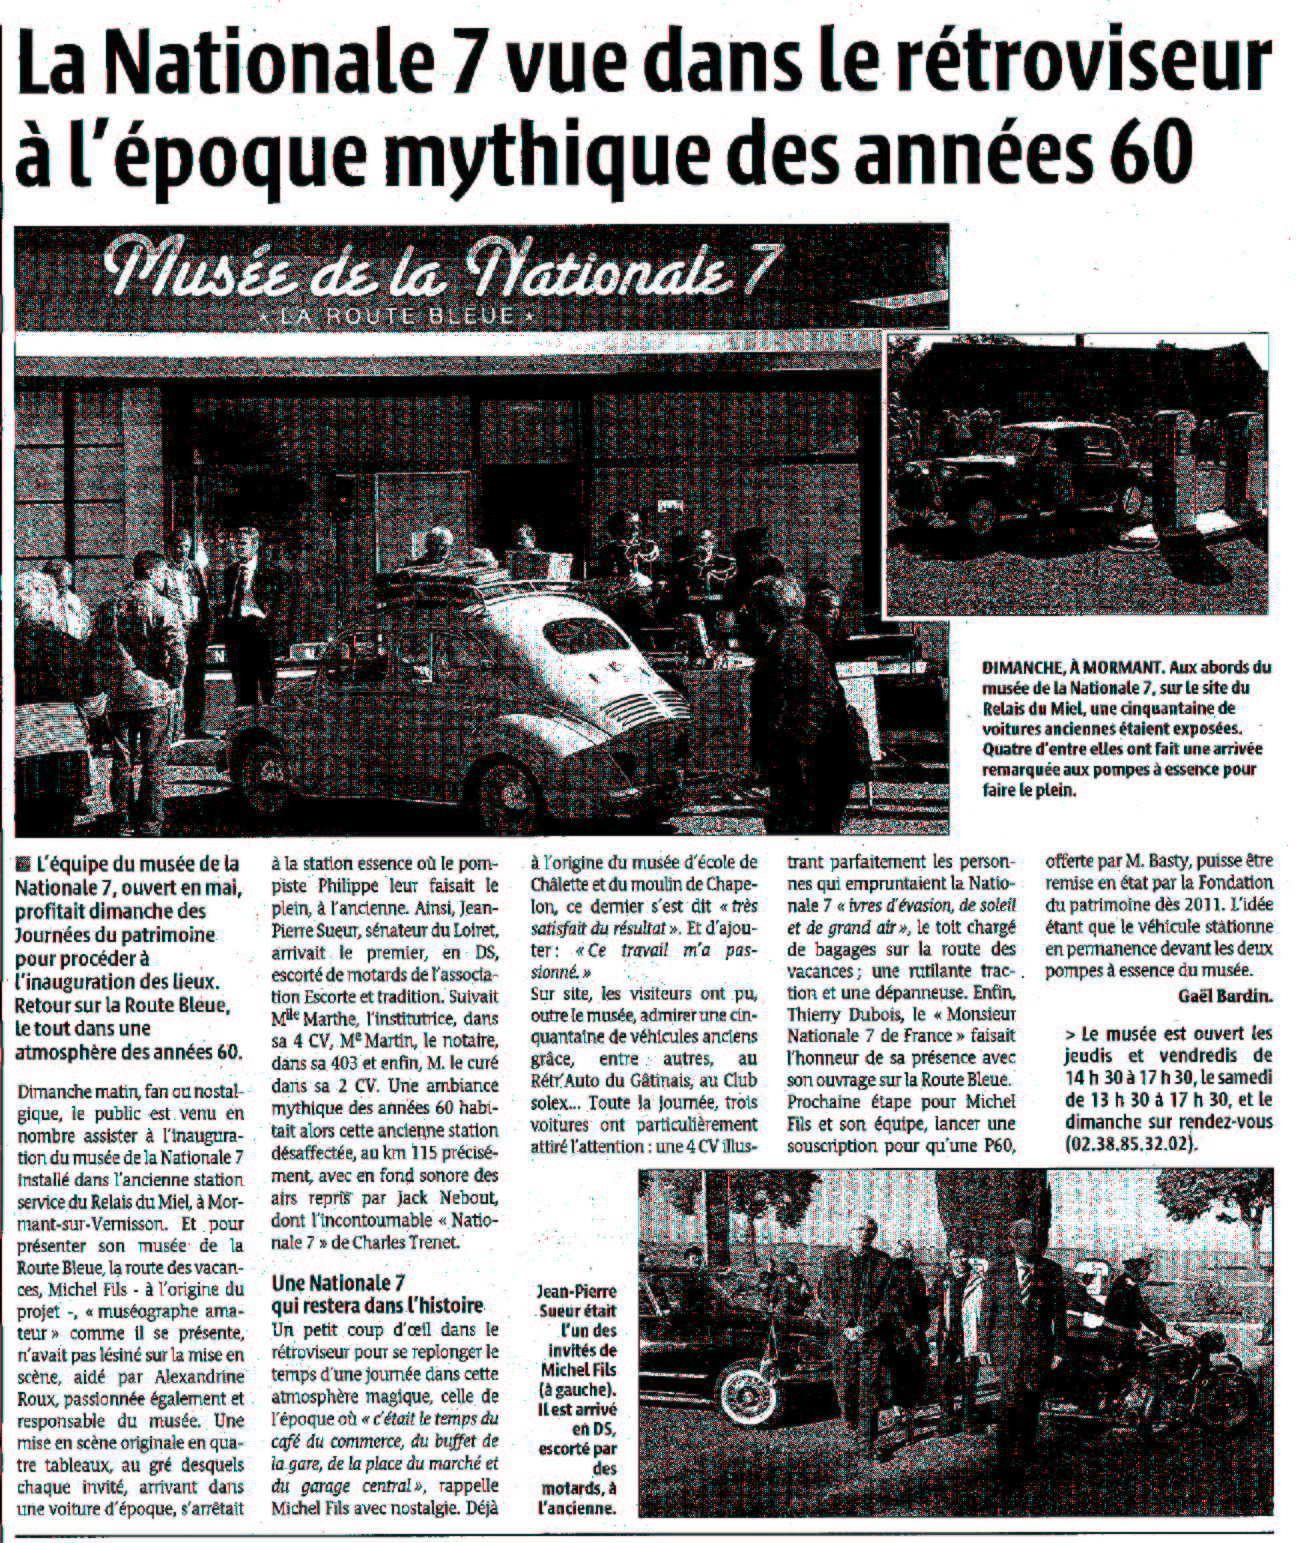 100920_LaRep_Nationale7